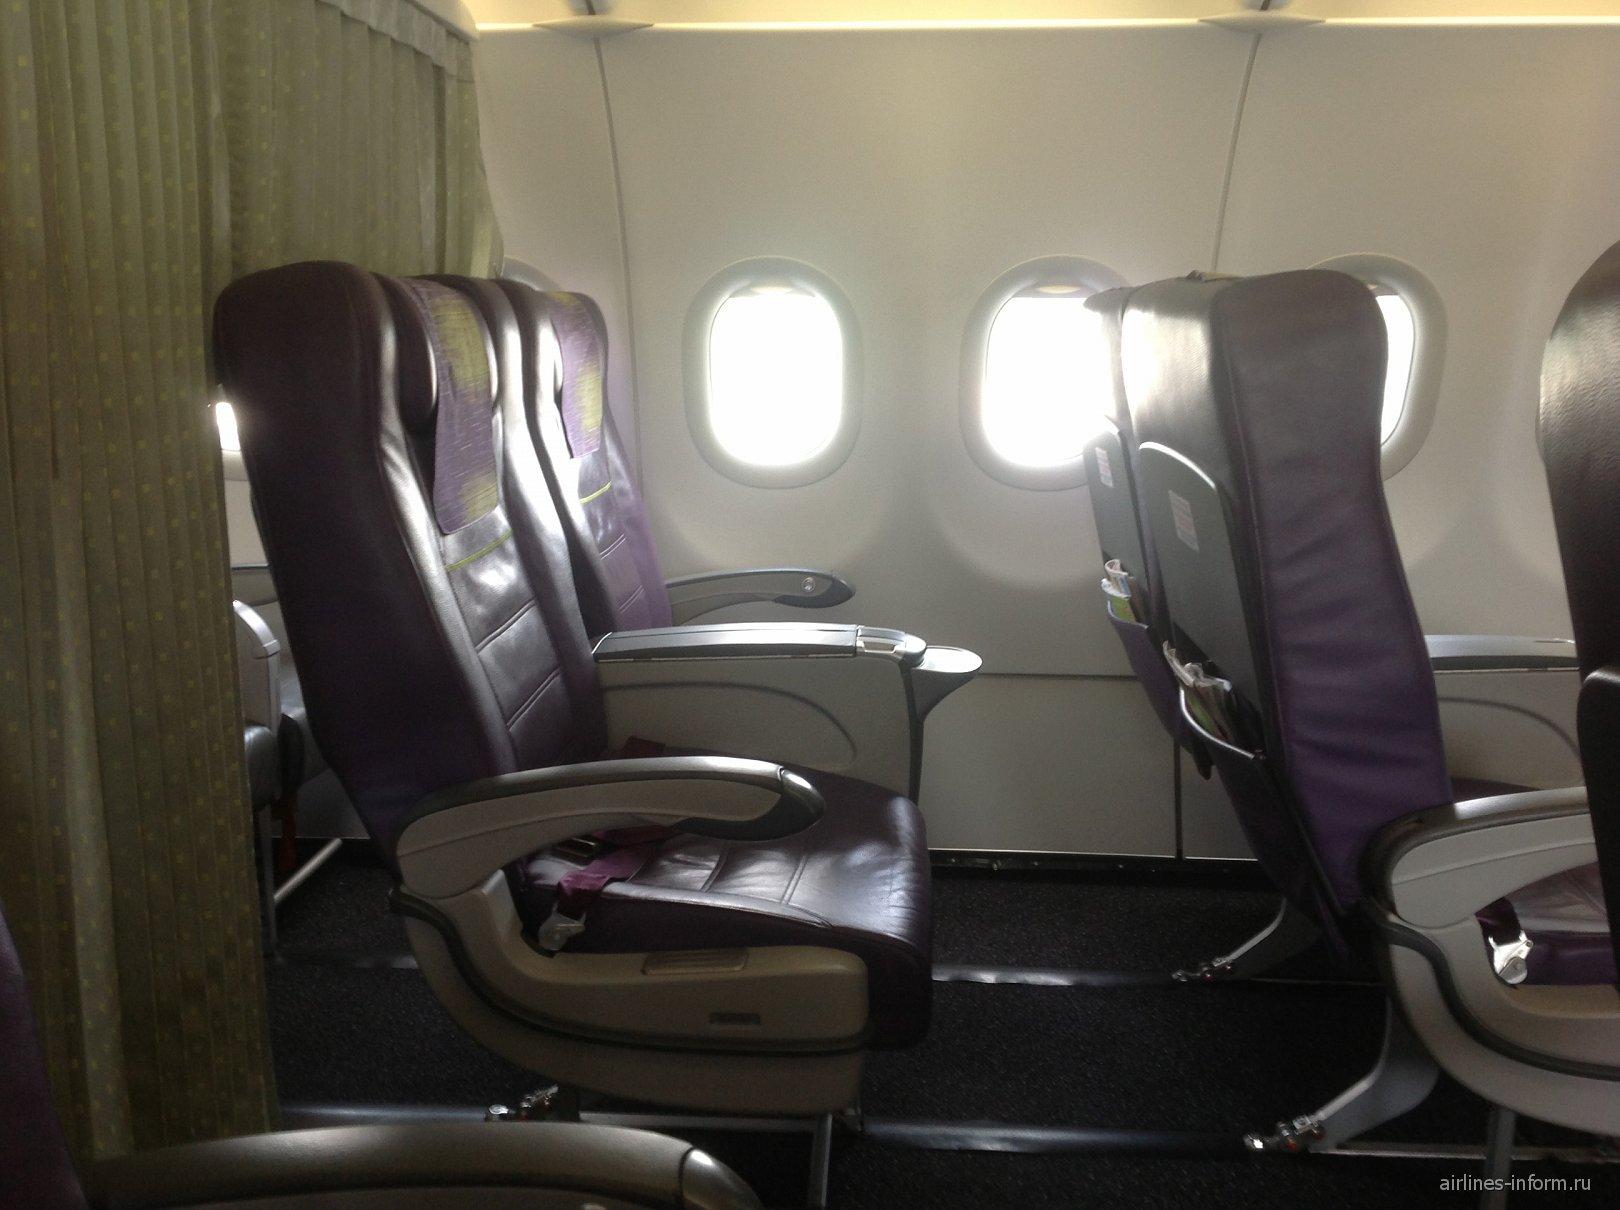 Бизнес-класс в самолете Airbus A320 авиакомпании S7 Airlines